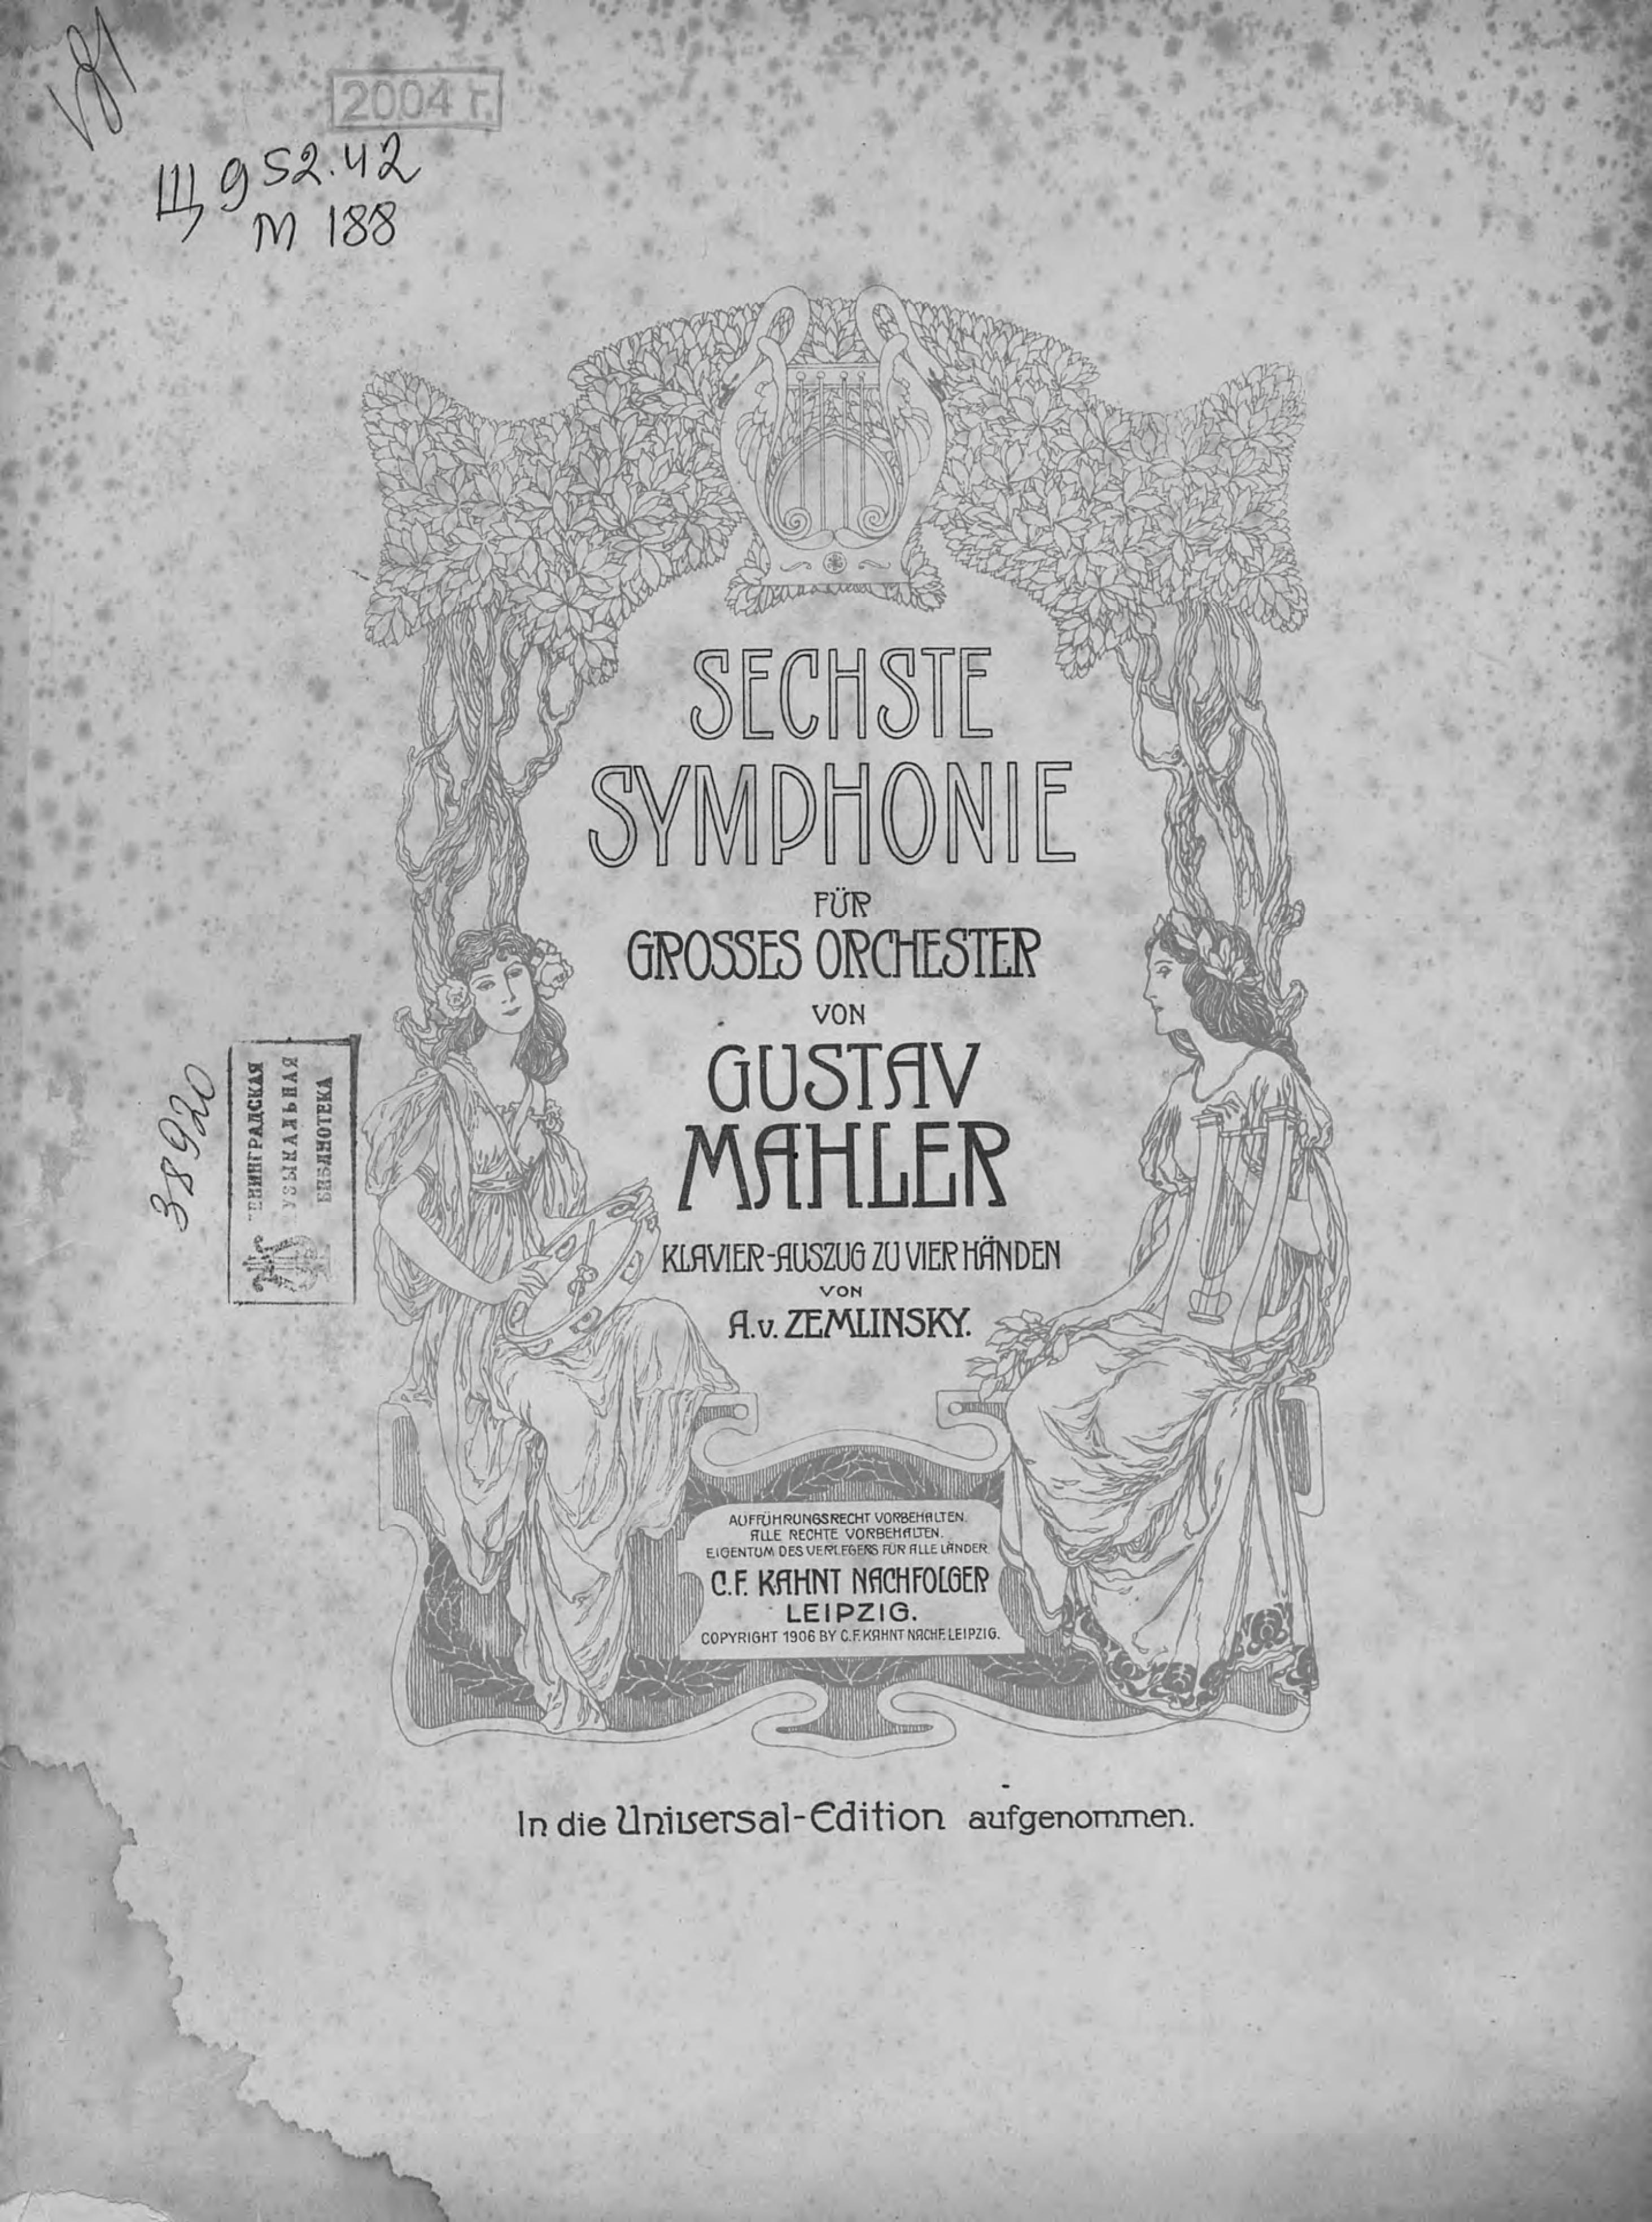 Густав Малер Sechste symphonie fur grosses orchester mein grosses sachen suchen wimmelbuch